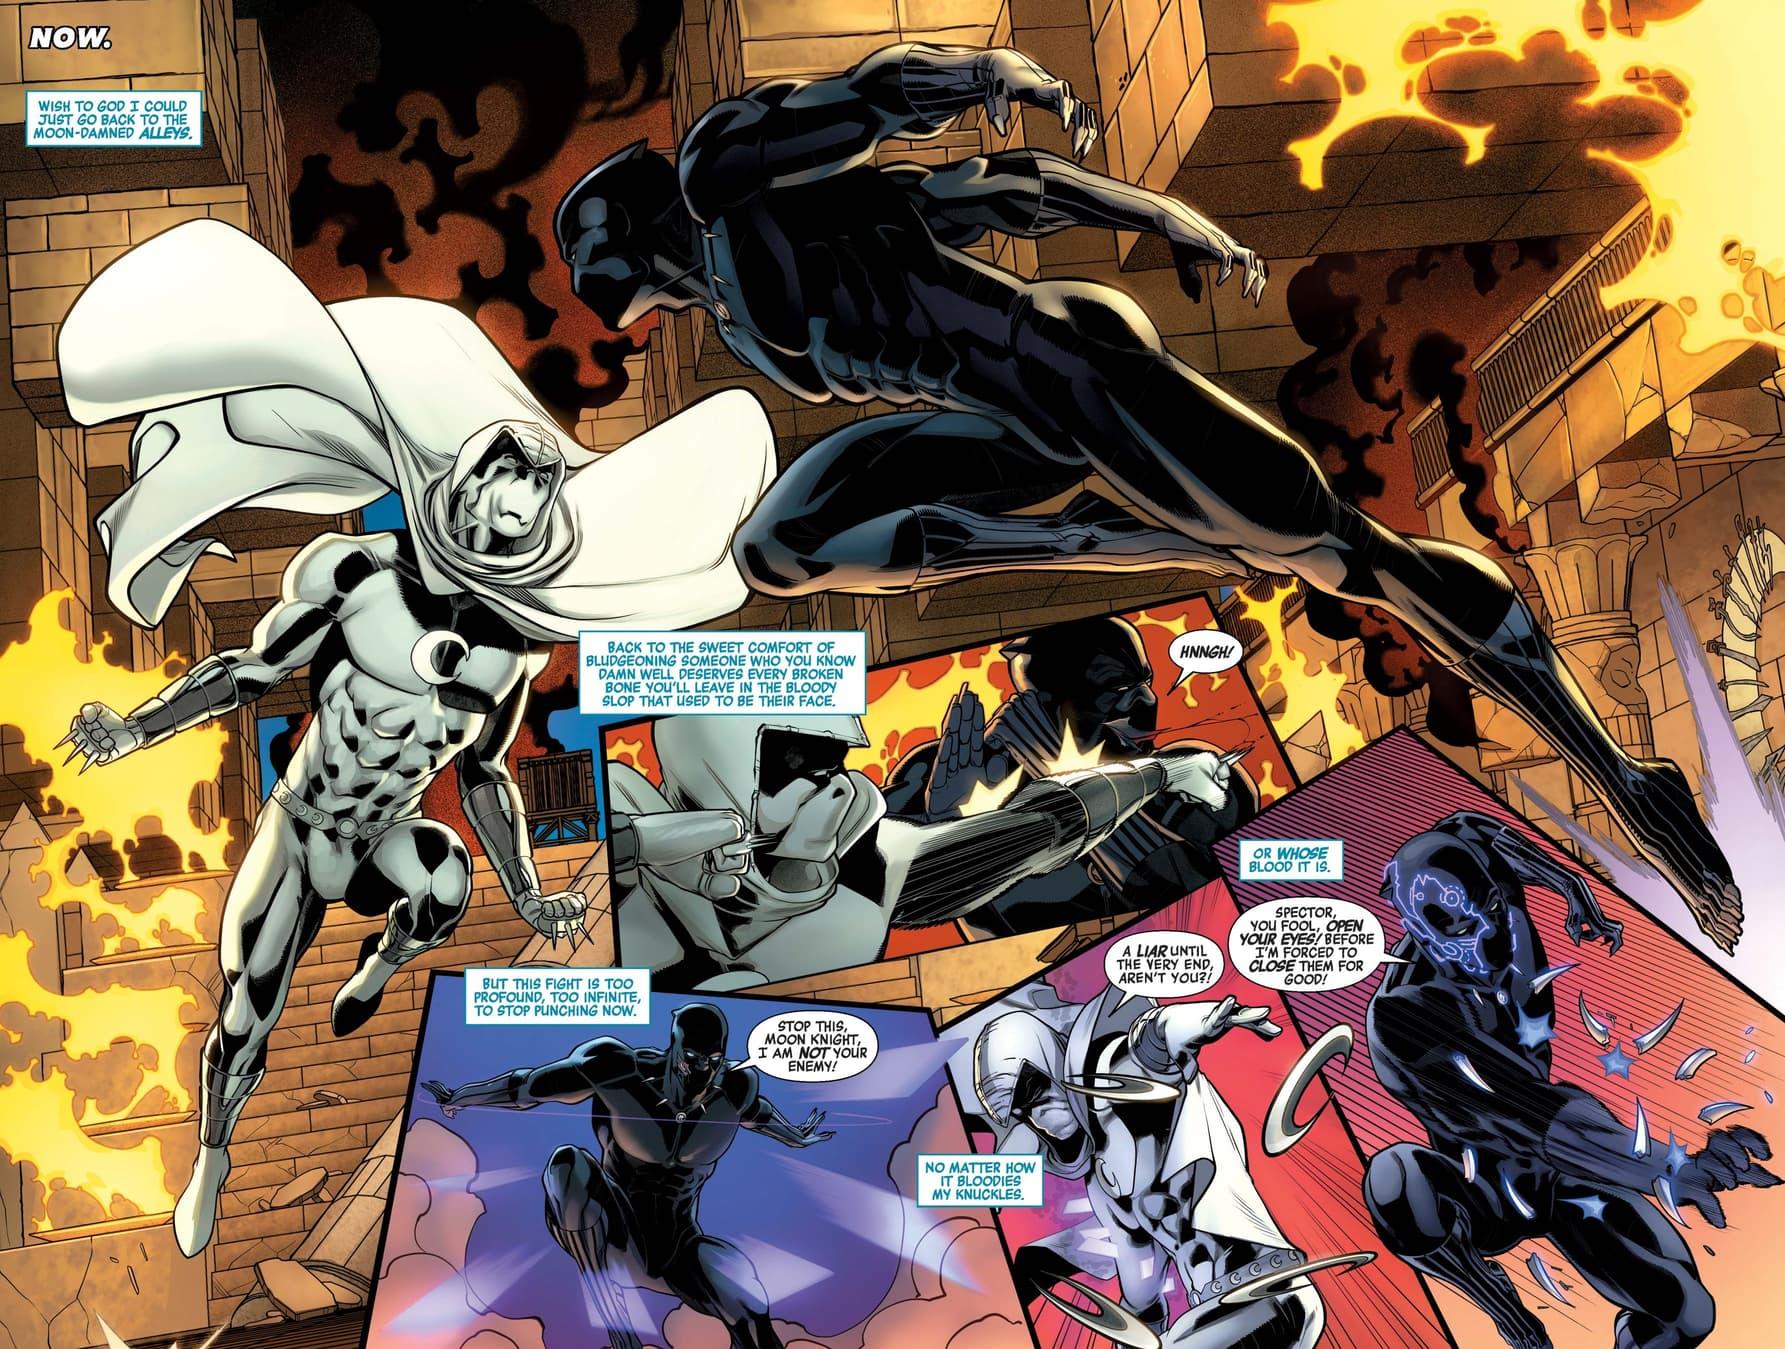 Moon Knight versus Black Panther